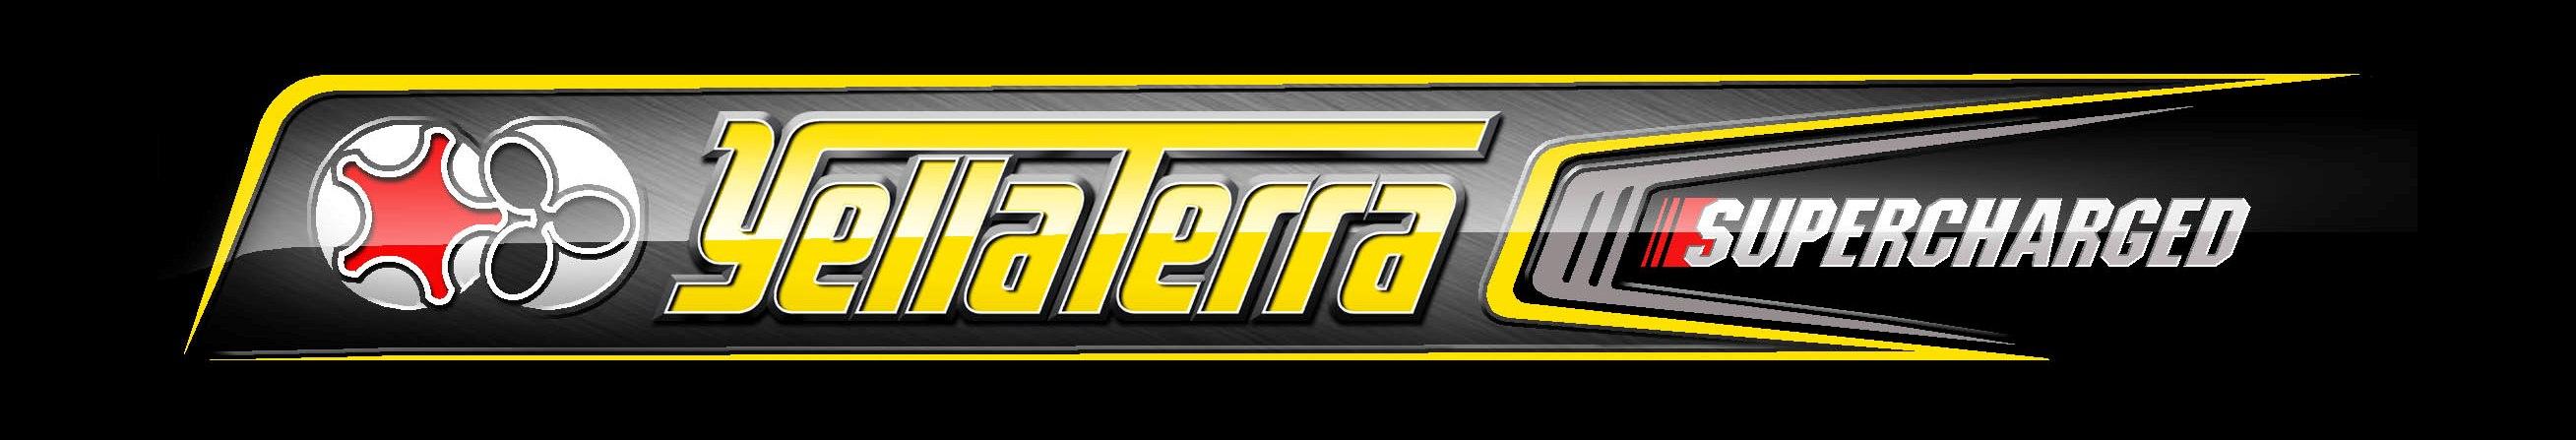 yt-supercharger-logo-001.jpg